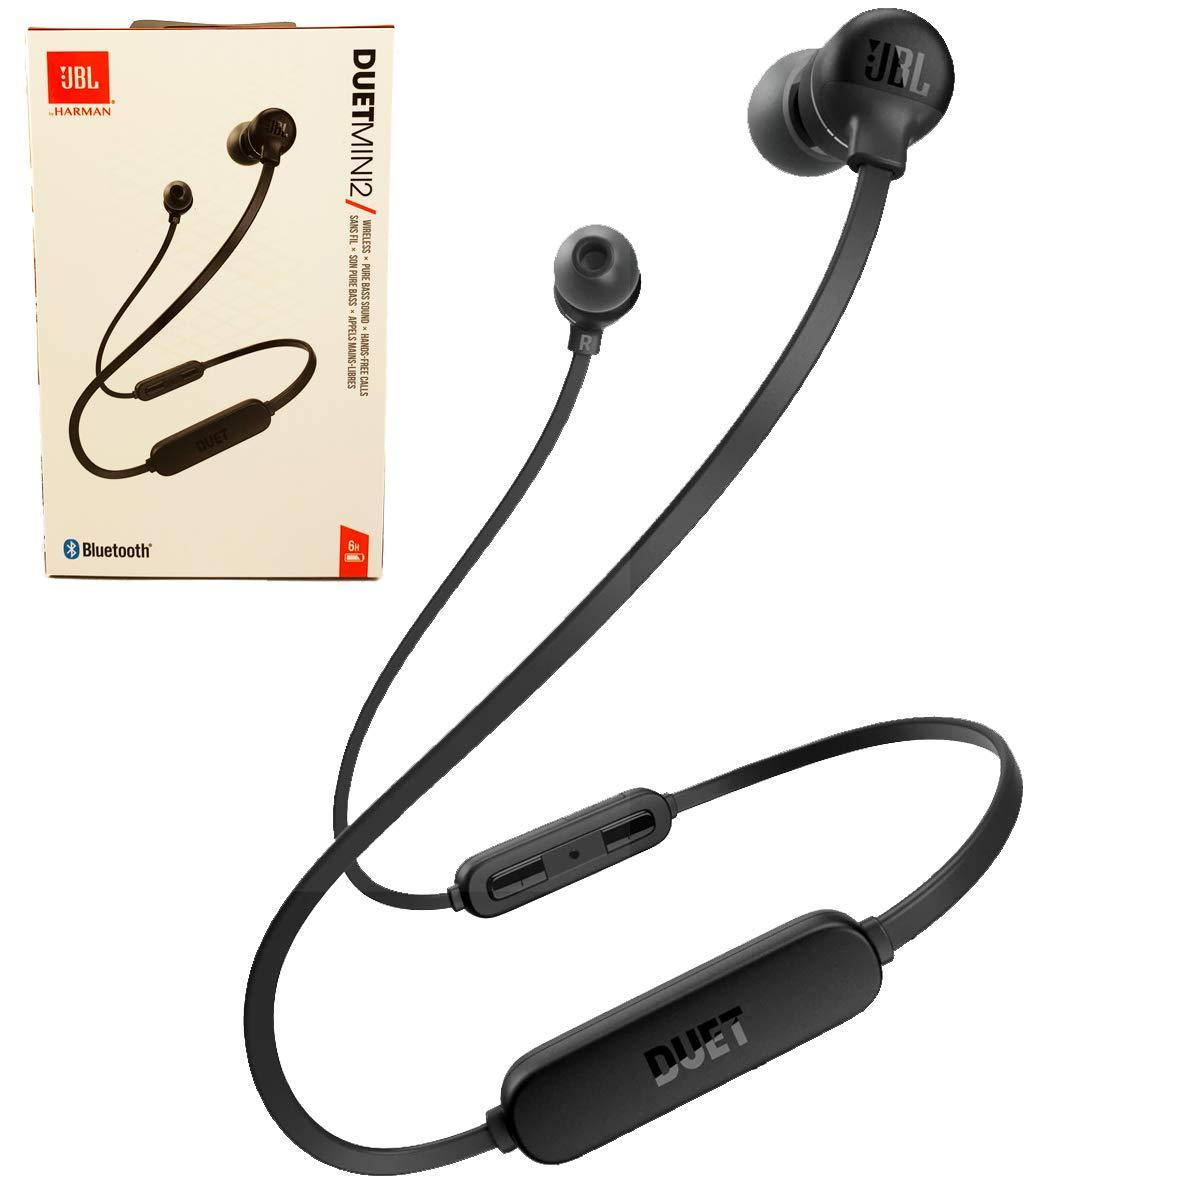 JBL Duet Mini 2 Wireless Bluetooth in-Ear Headphones/Earbuds Hands Free Calls Pure Bass Sound (Black)